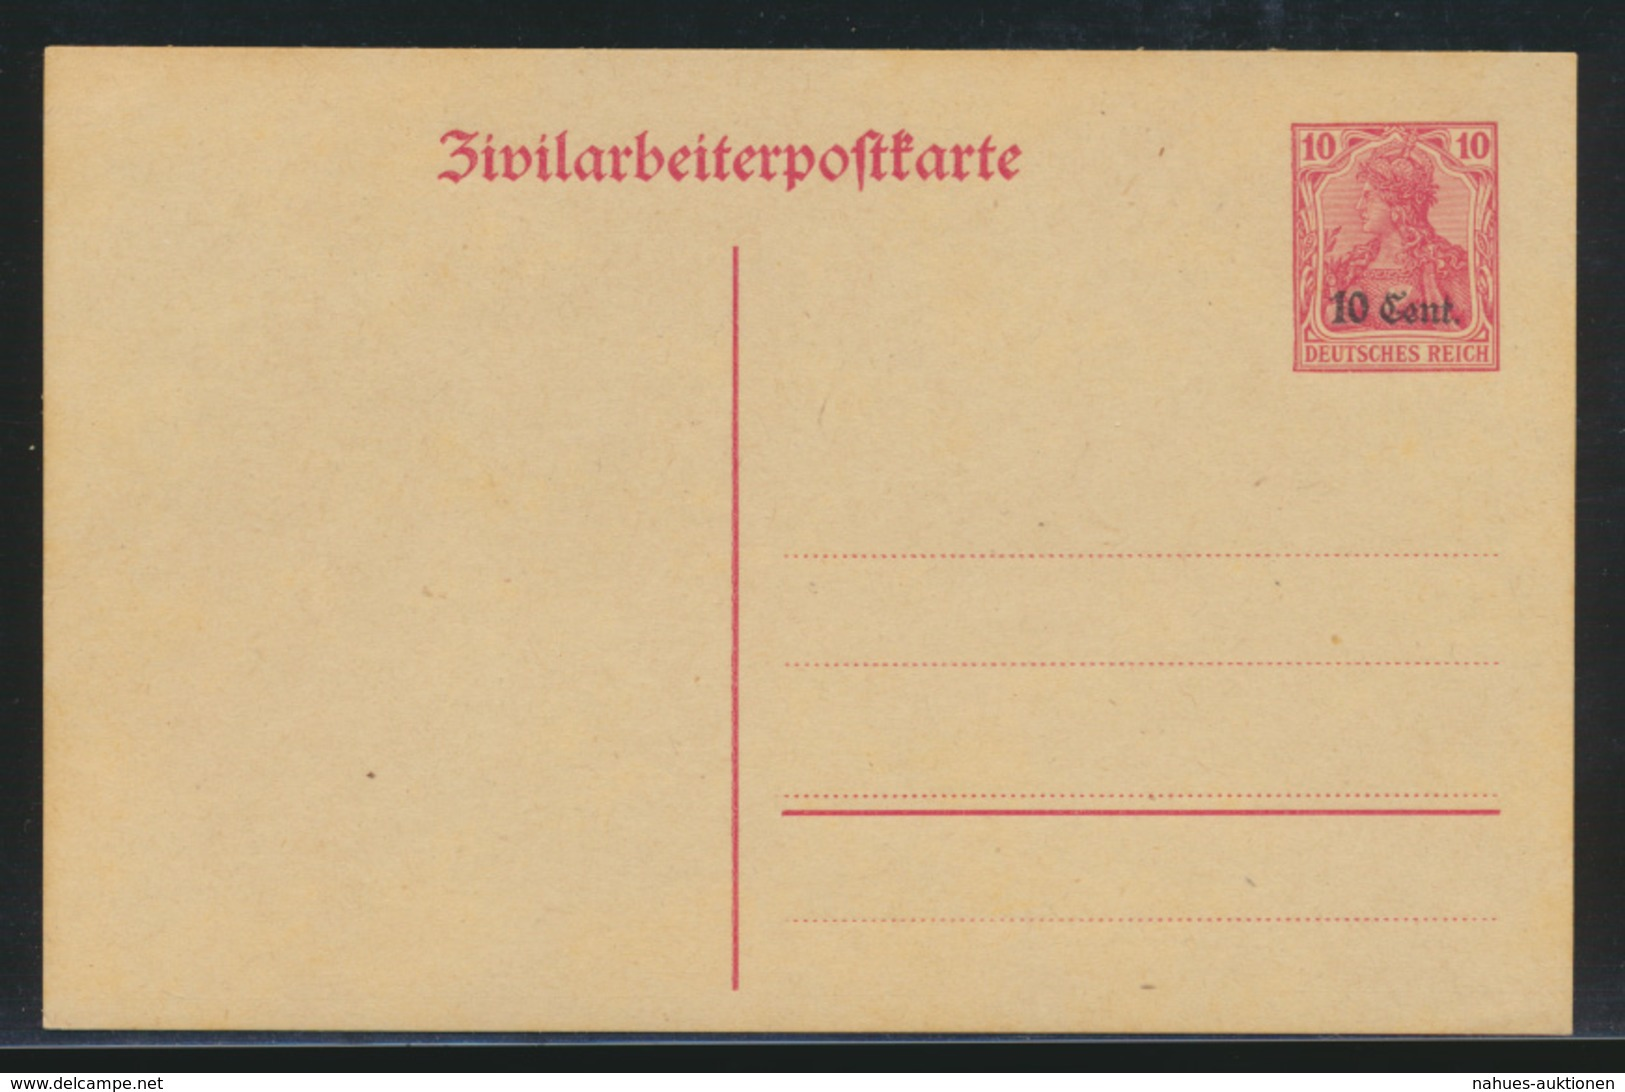 Besetzung 1914-18 Ganzsache Etappengebiet West Zivilarbeiterpostkarte P 6 Kat.14 - Besetzungen 1914-18